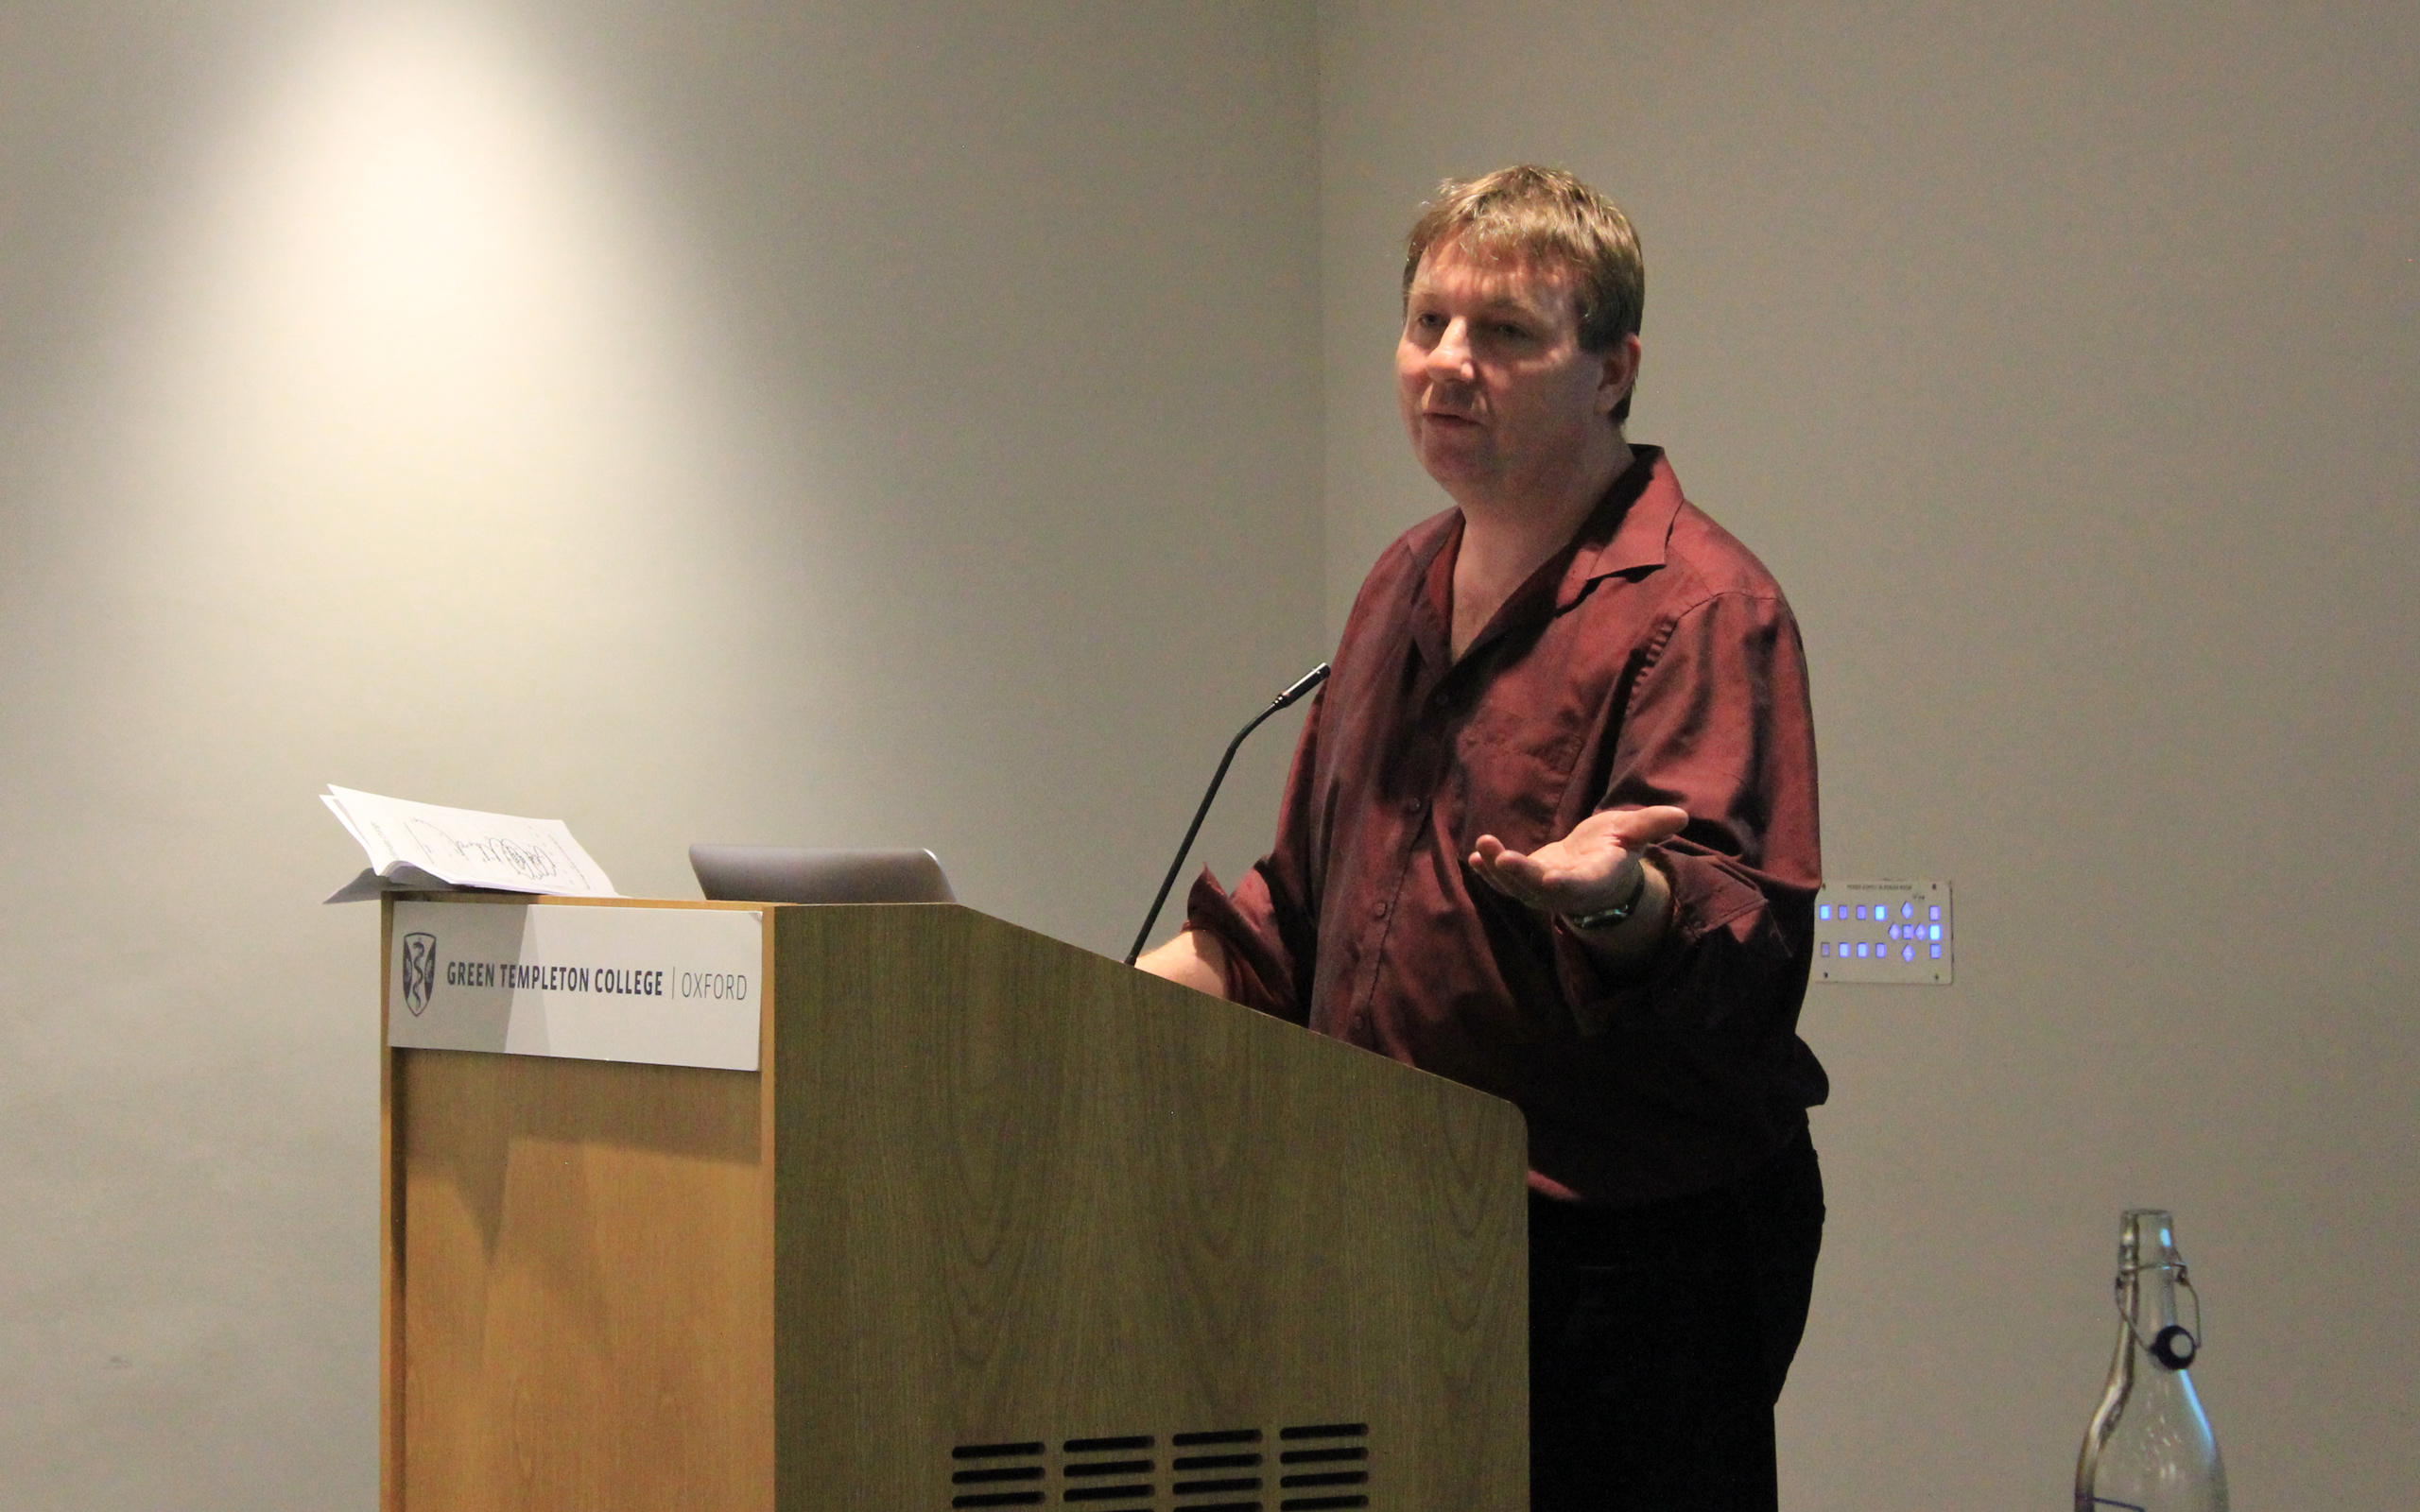 Danny Dorling presents at the inaugural Green Templeton Social Sciences Seminar Series, 6 February 2019